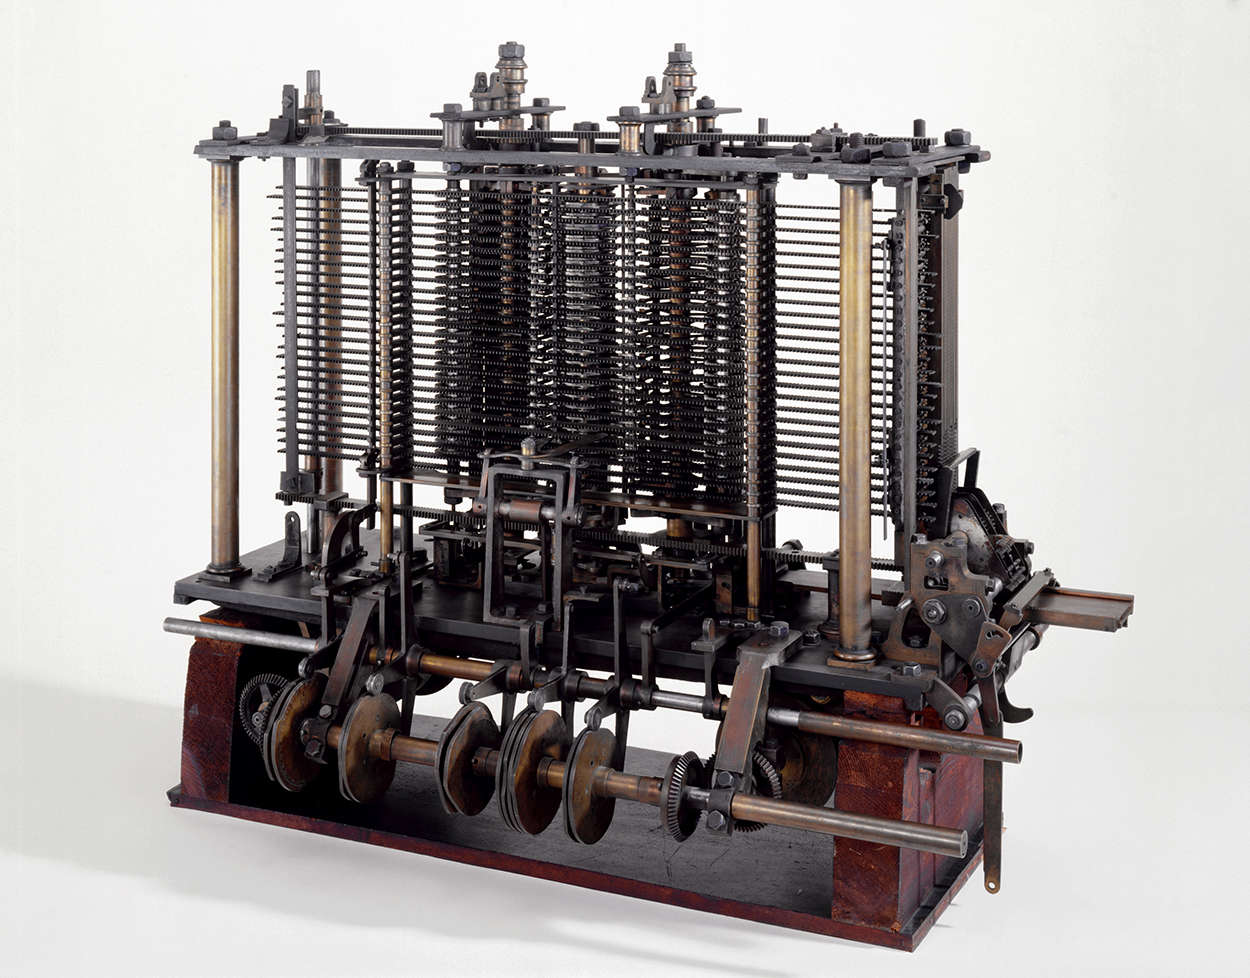 Rare Ӎonsters Babbag10